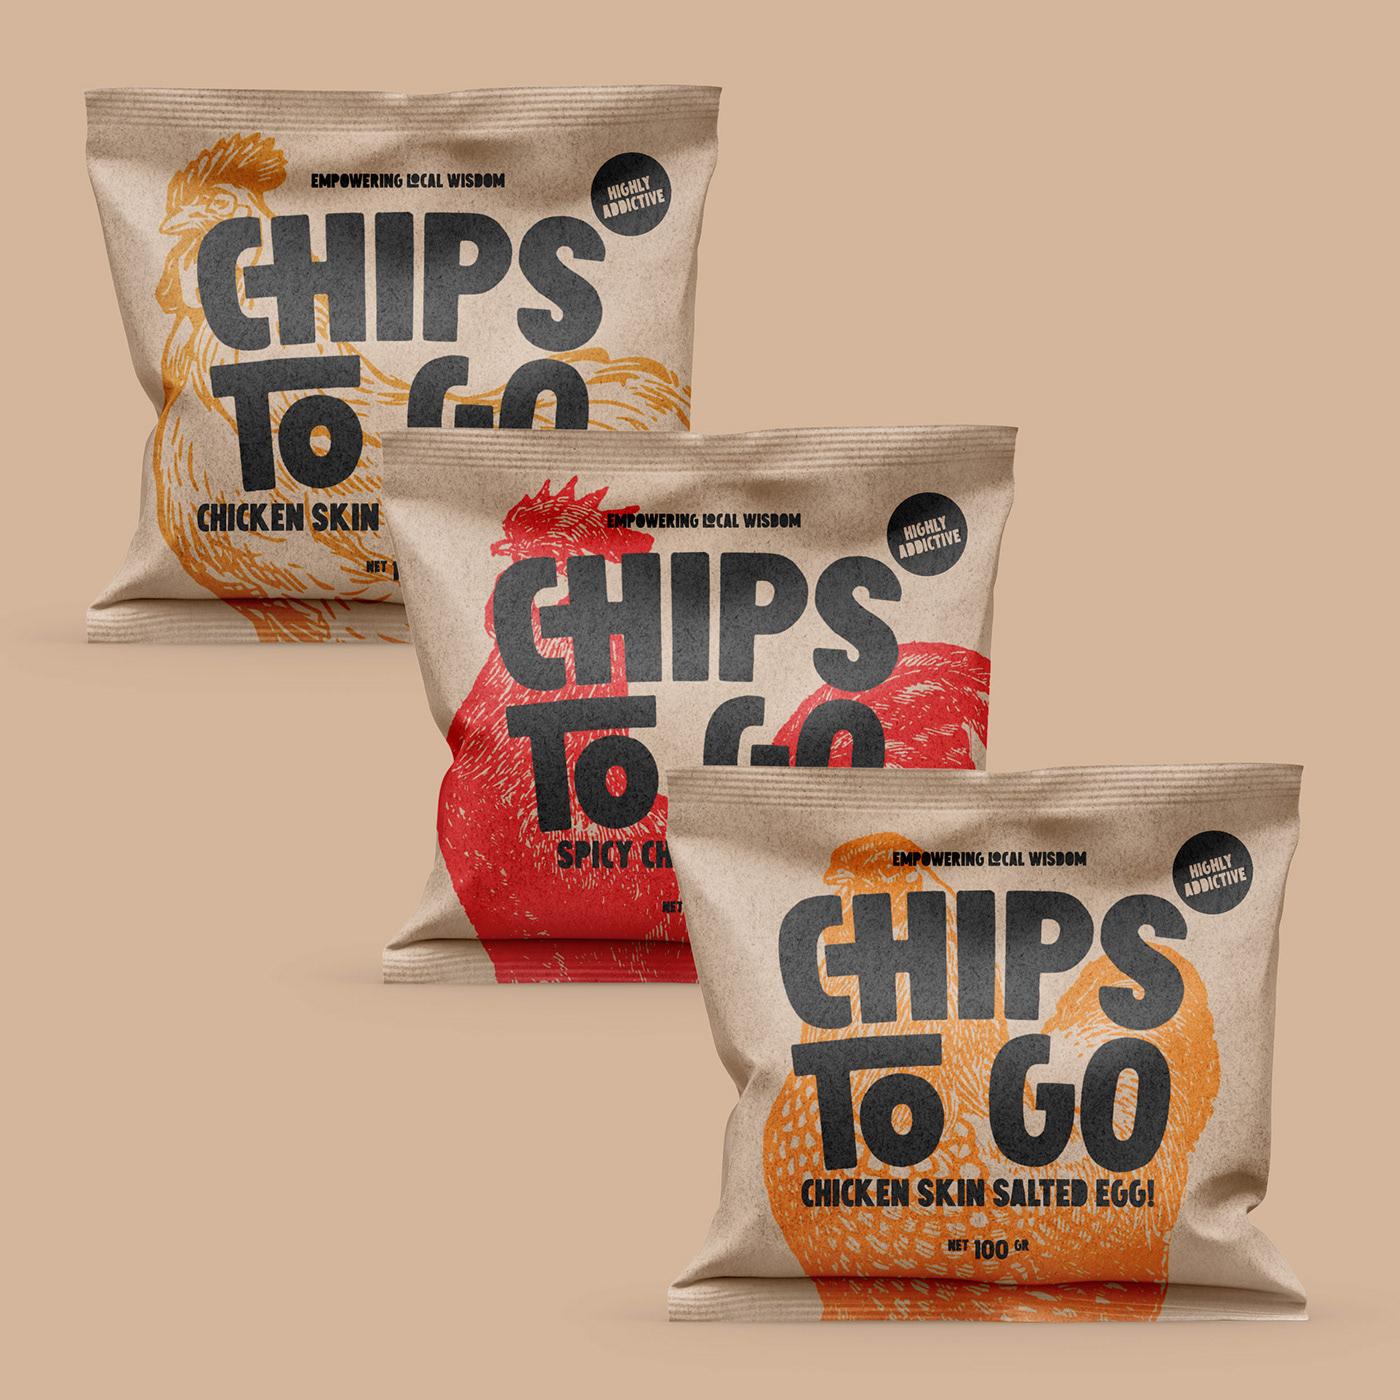 chips Chicken Chips Chicken skin snack snack food snacks snack packaging packaging design branding  Food